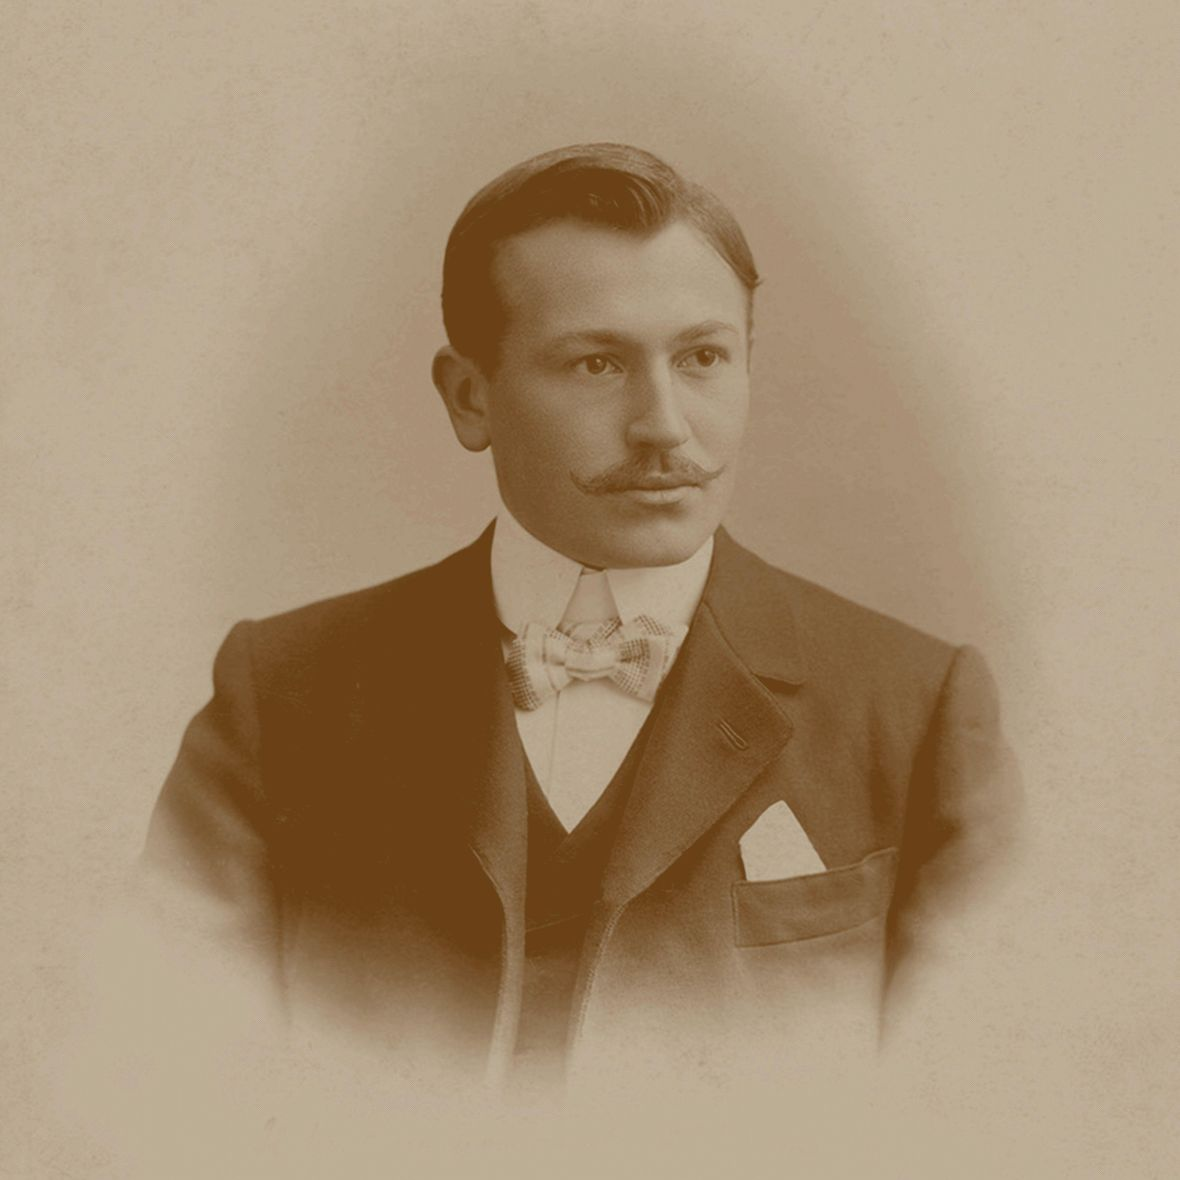 Rolex Founder Hans Wilsdorf History and Timeline